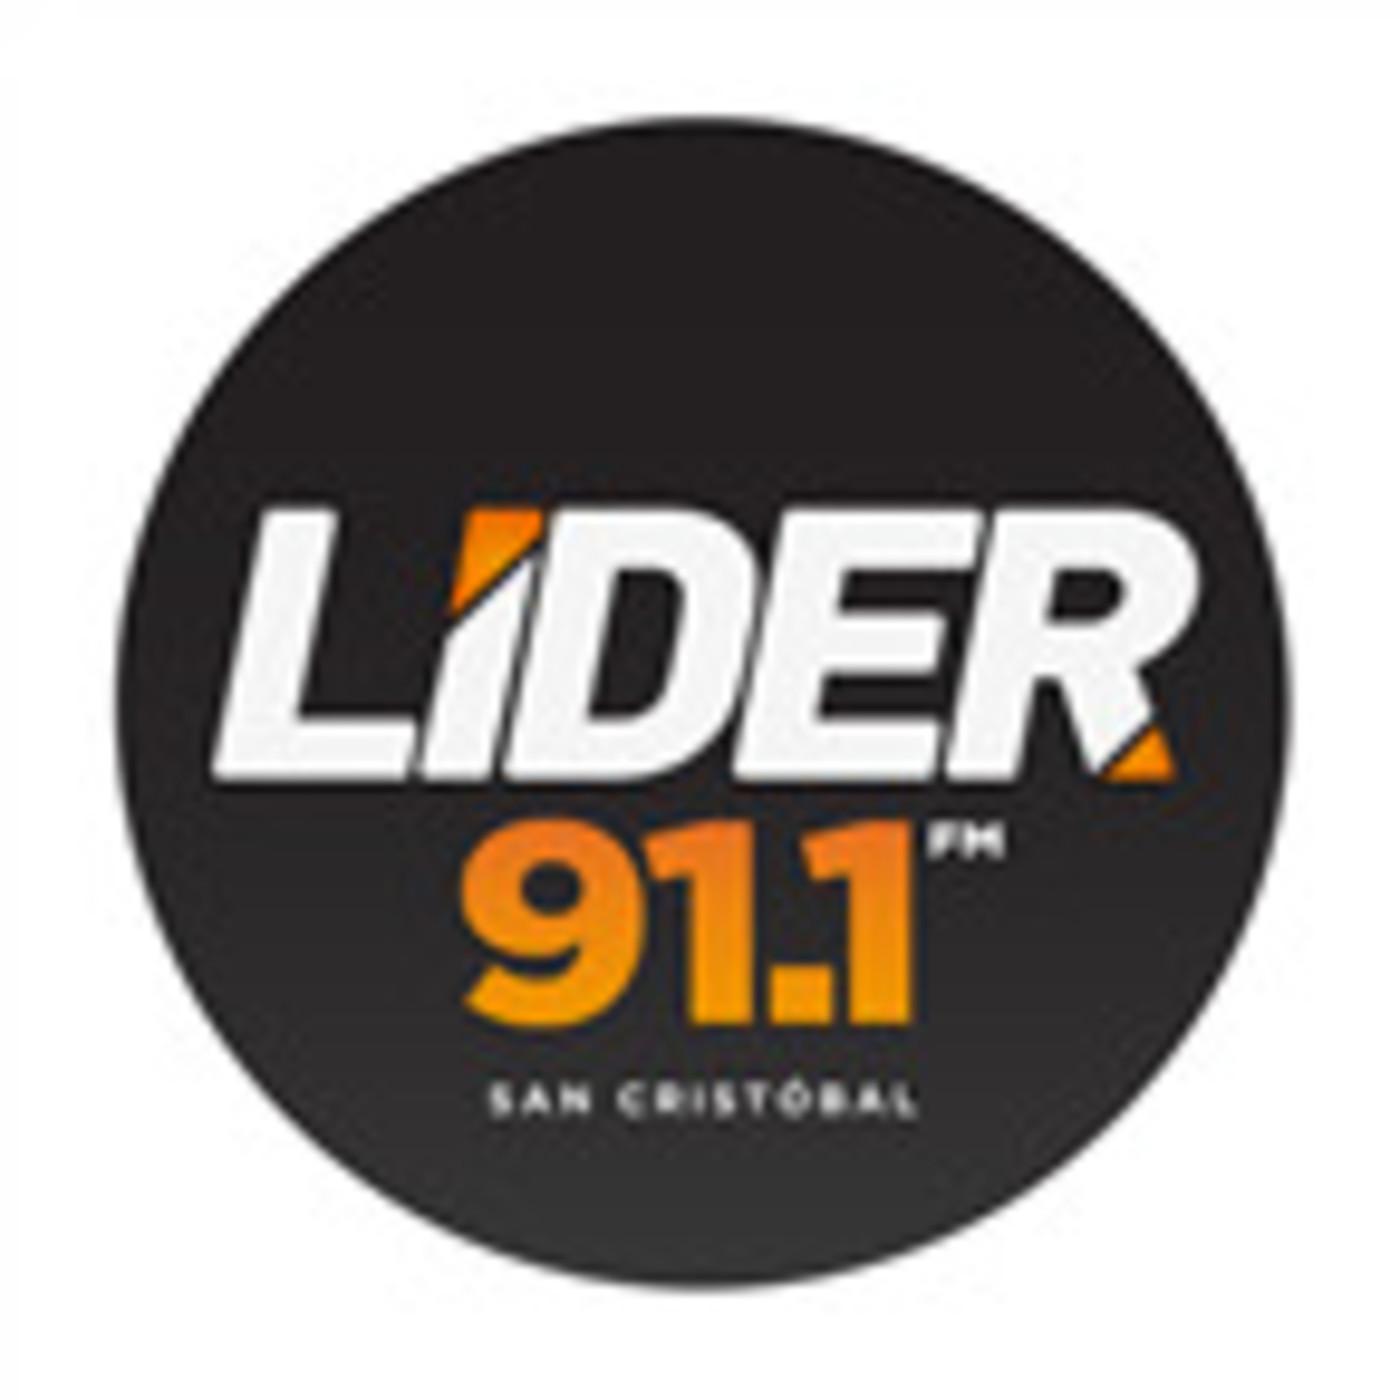 Lider 91.1 FM (San Cristobal